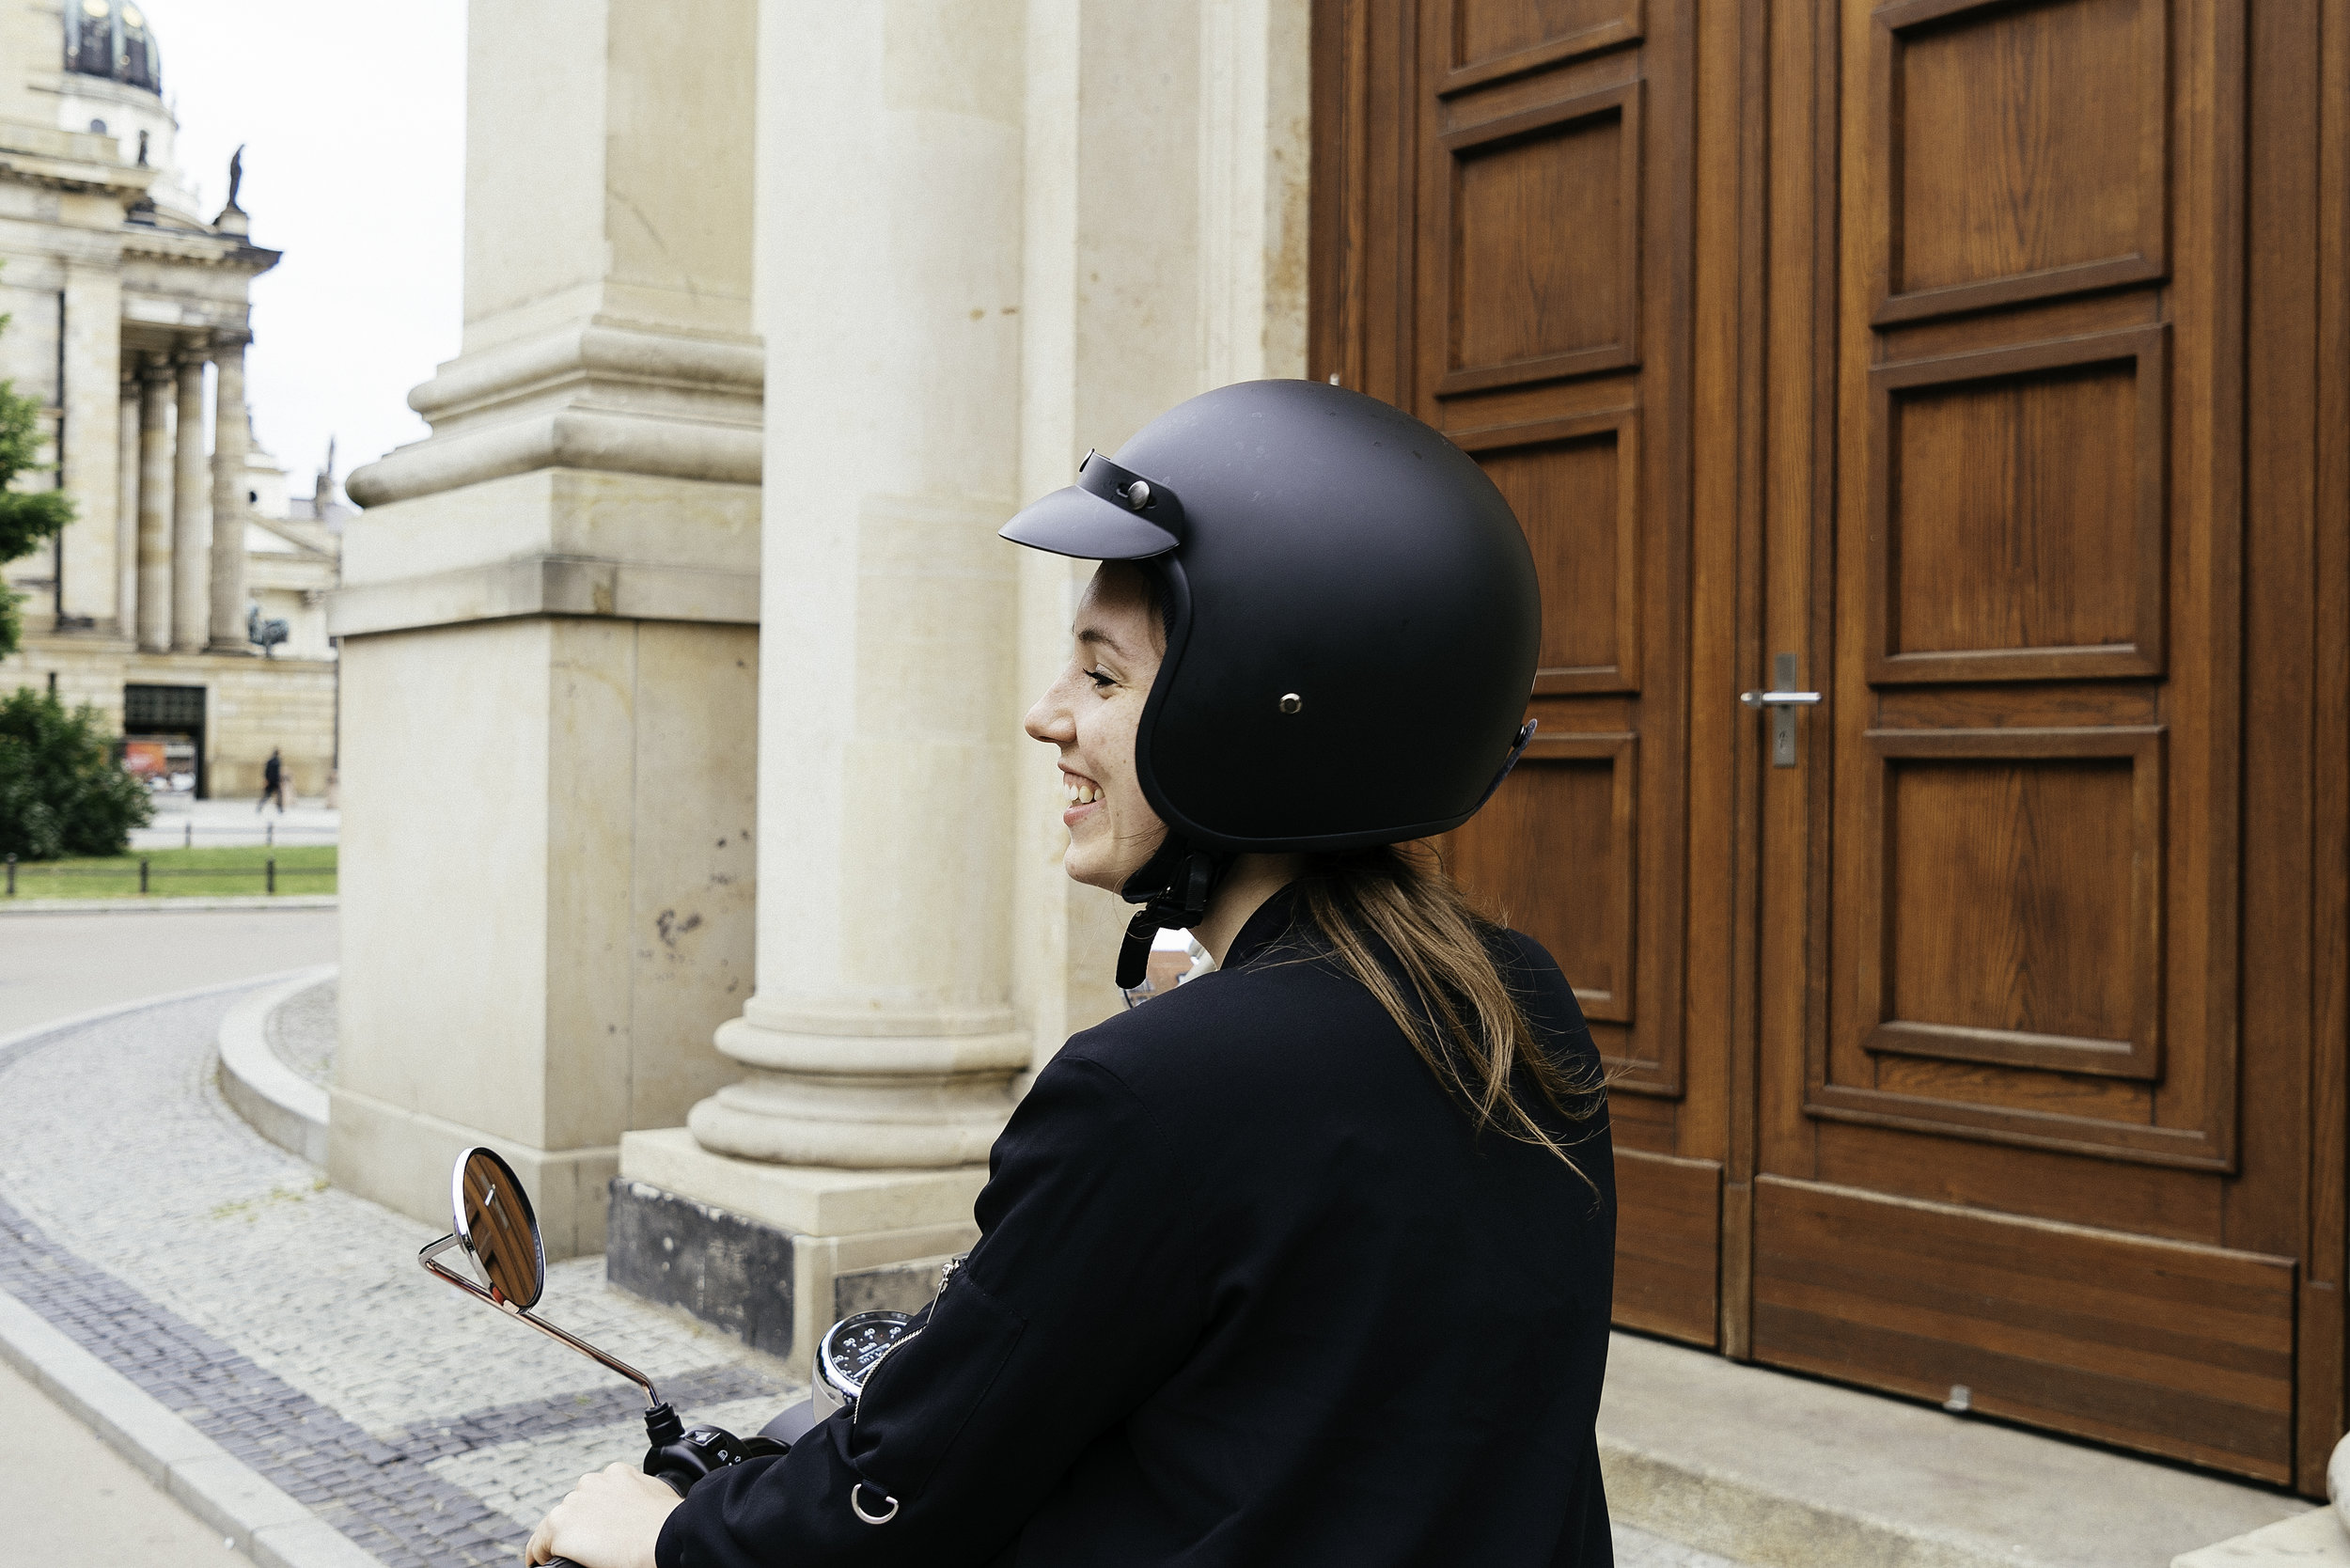 Jael Martin on her new Matte Black unu Scooter